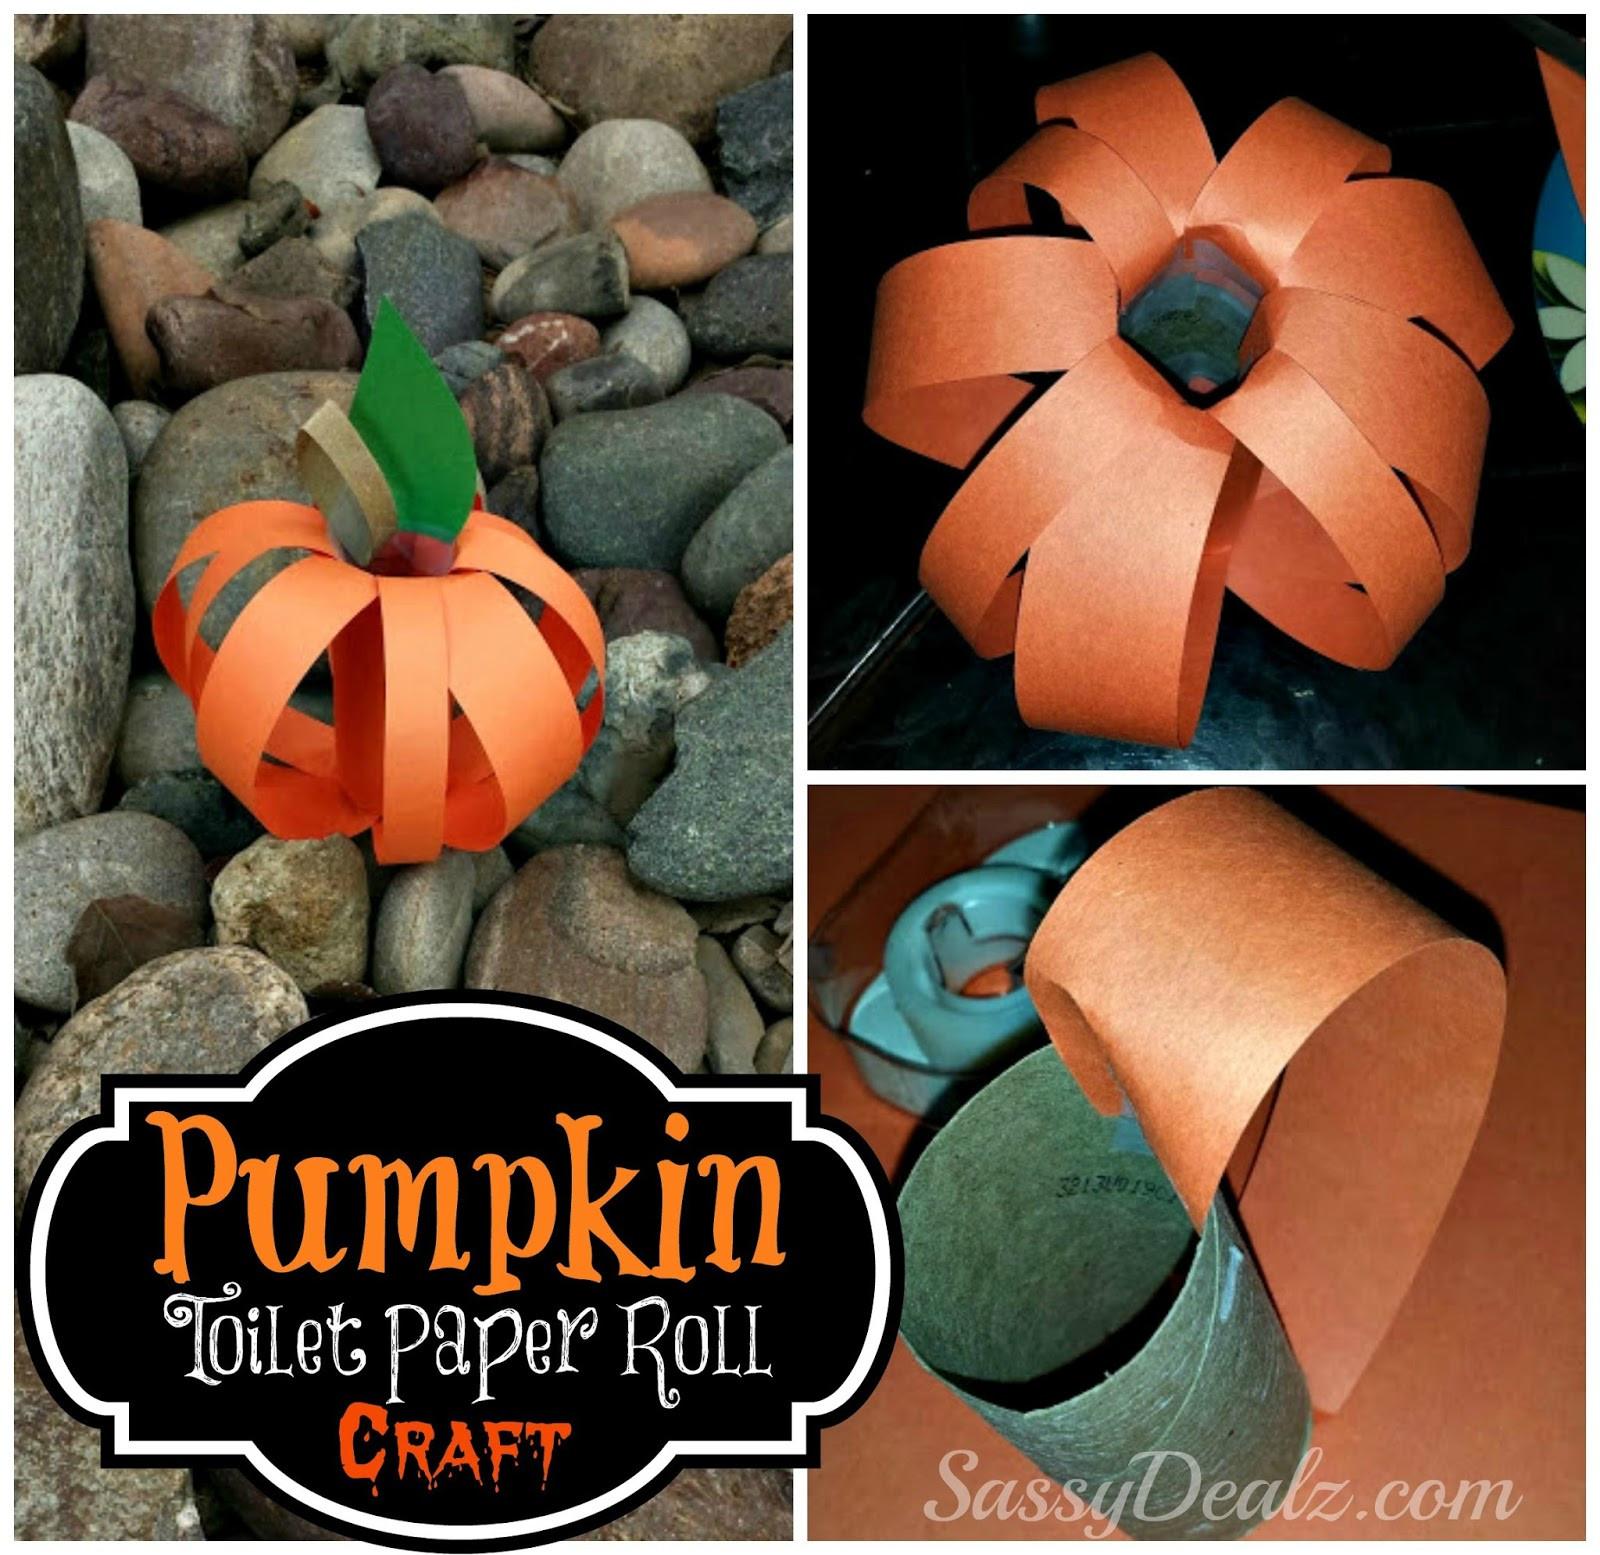 Toilet Paper Roll Halloween Craft  Pumpkin Toilet Paper Roll Craft For Kids Halloween Idea